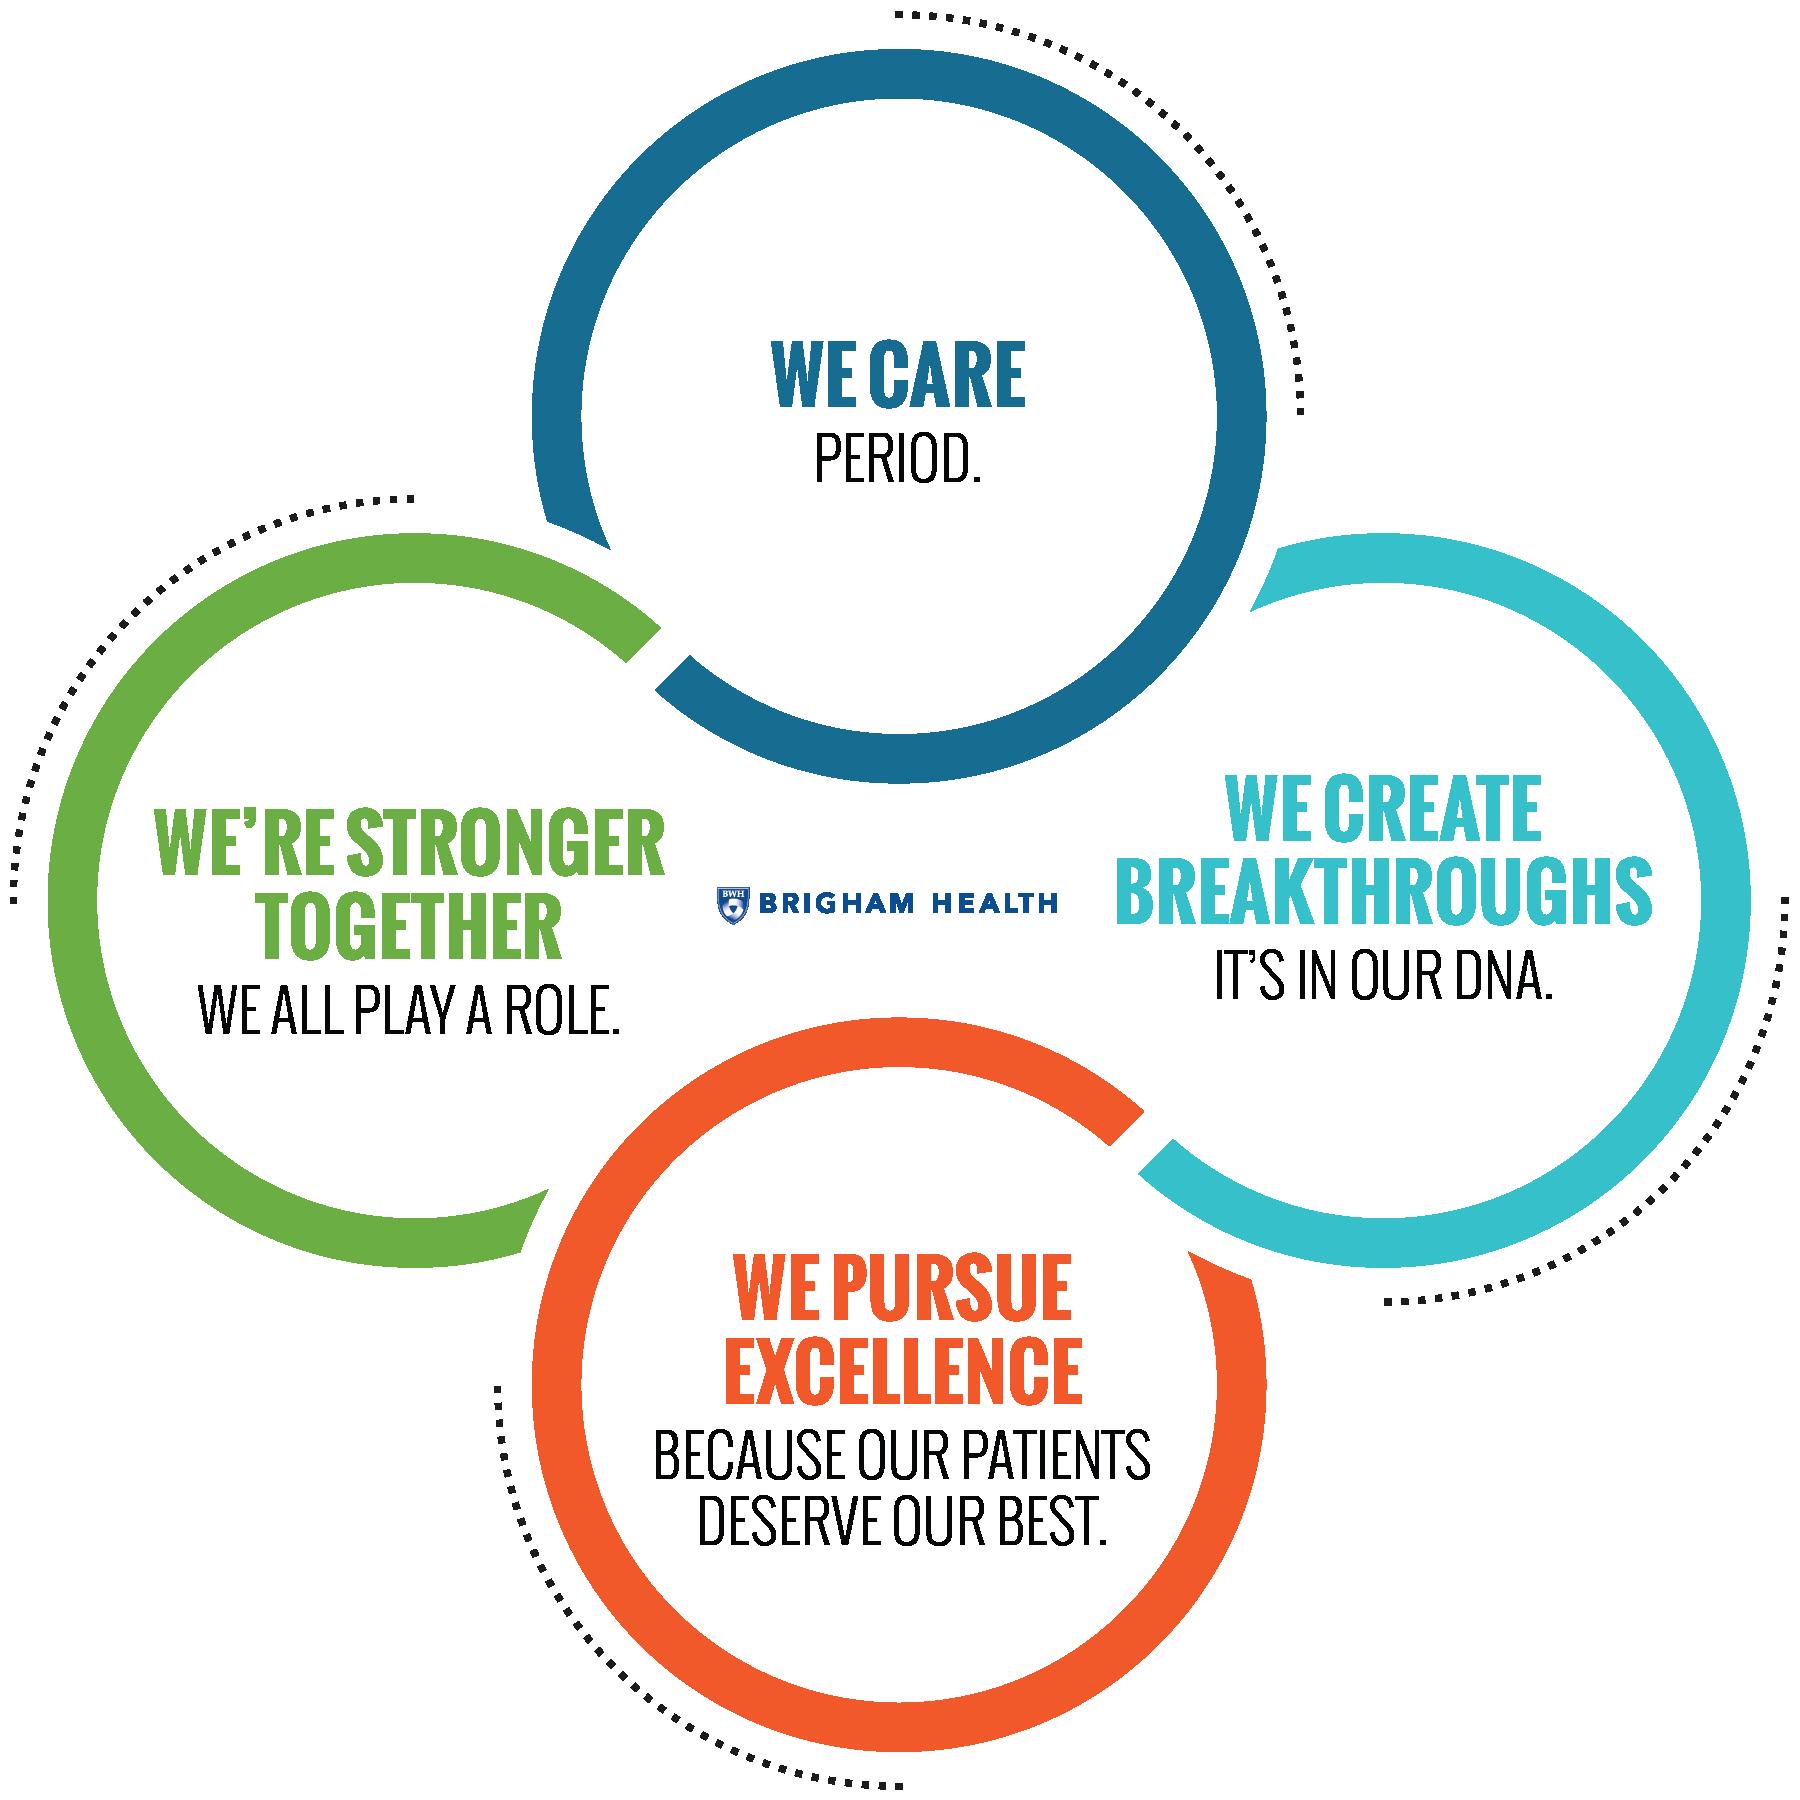 bwh values logo